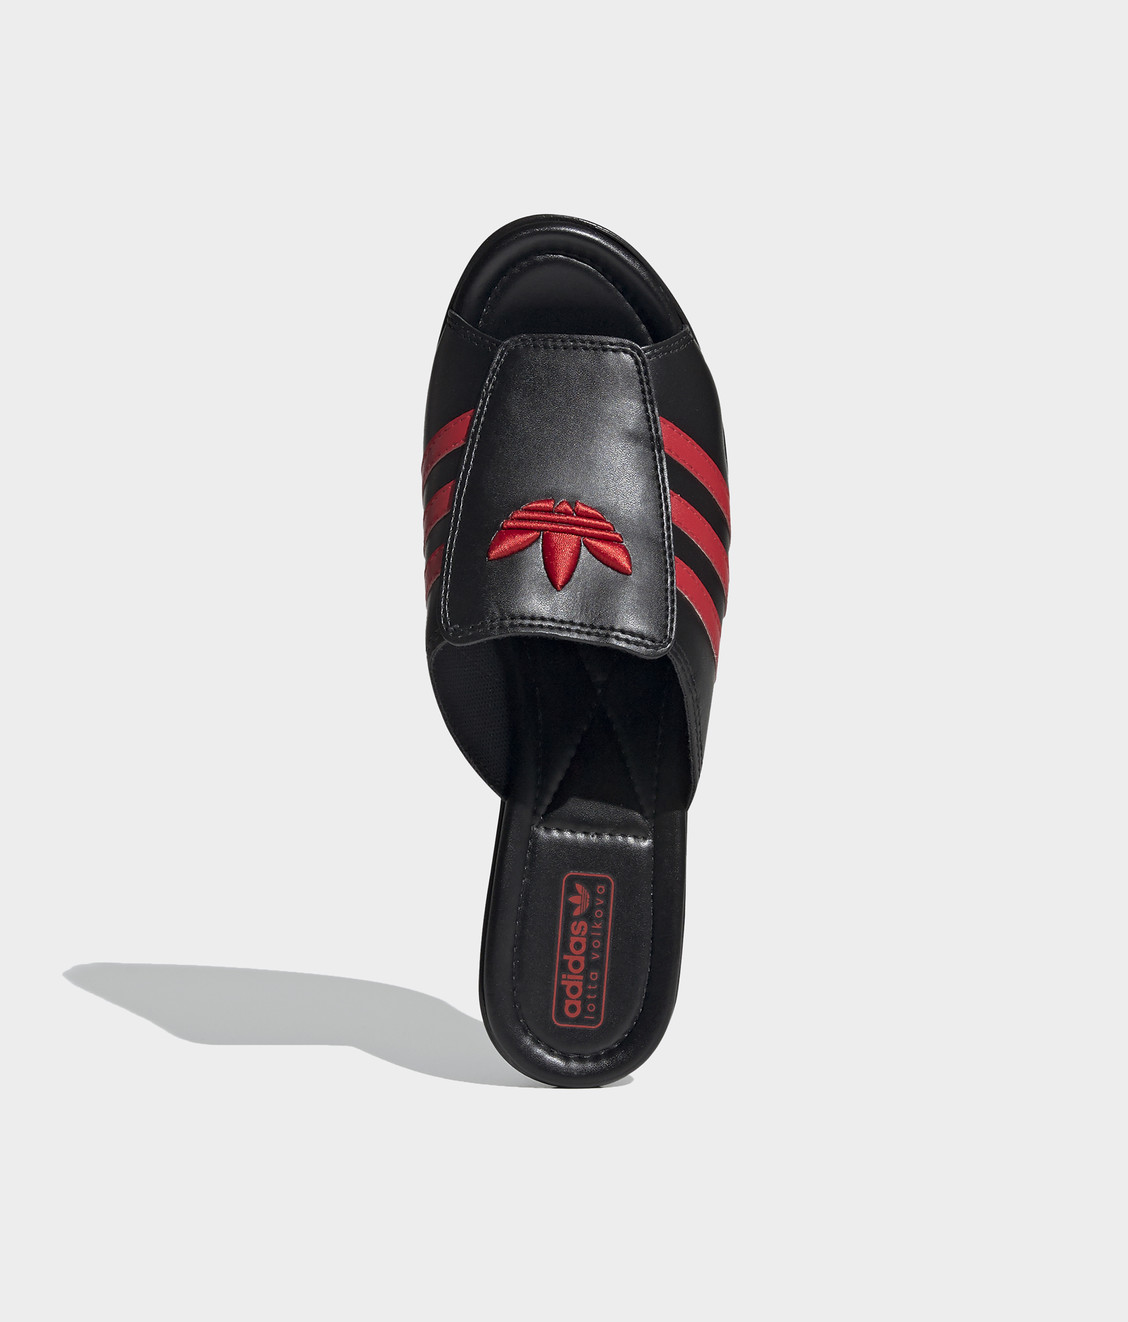 Adidas Adidas Lotta Volkova Trefoil Clogs Black